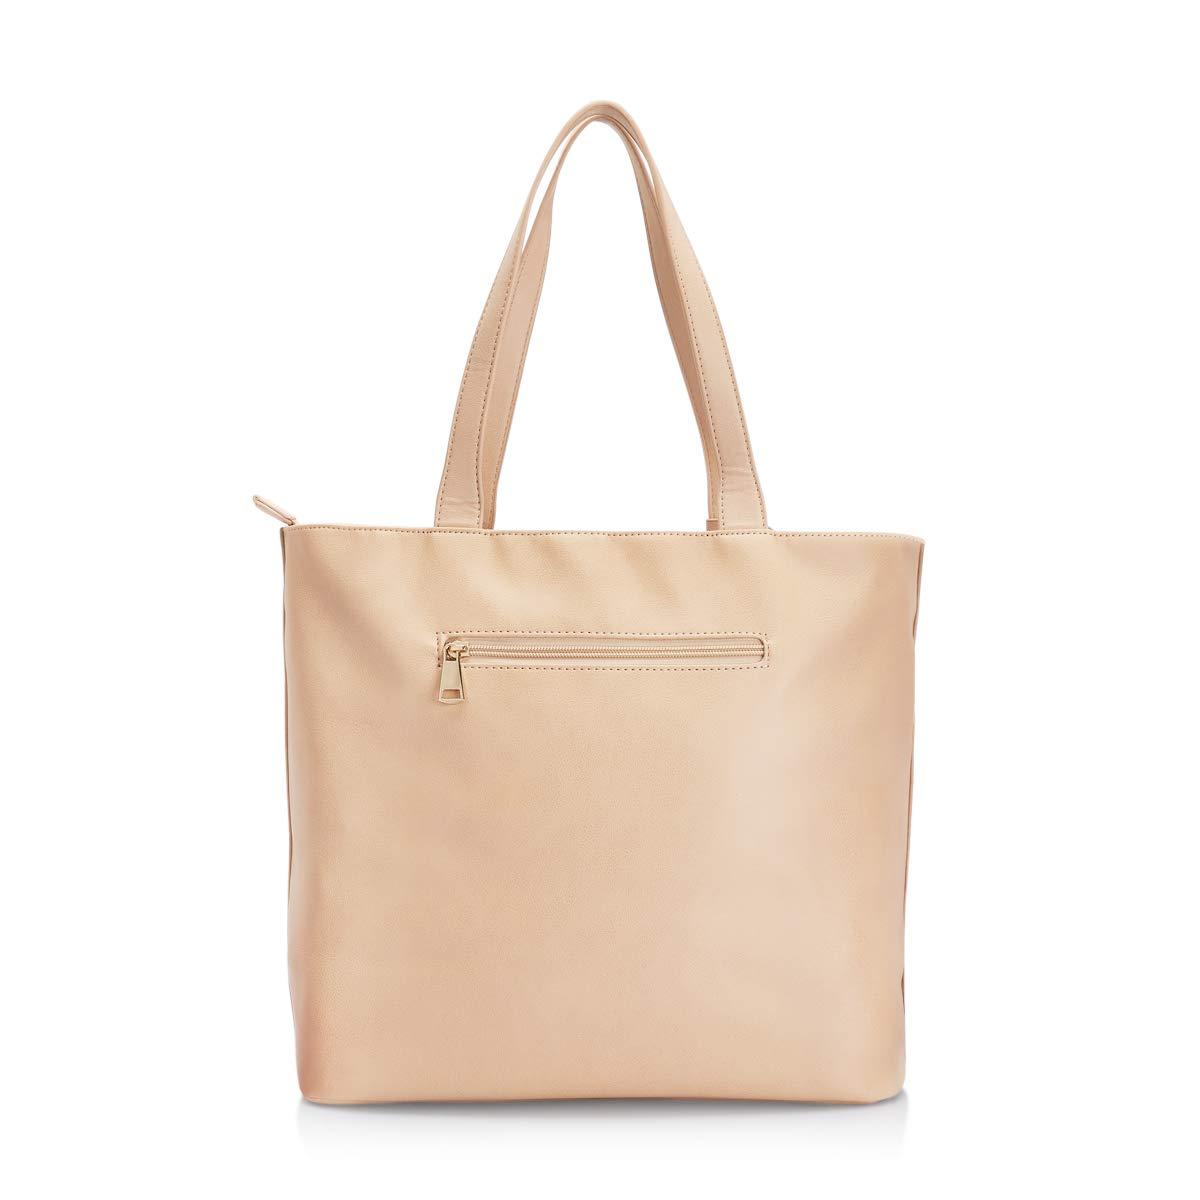 2afdc20e6b Caprese Vienna Women s Tote Bag (Skin)  Amazon.in  Shoes   Handbags